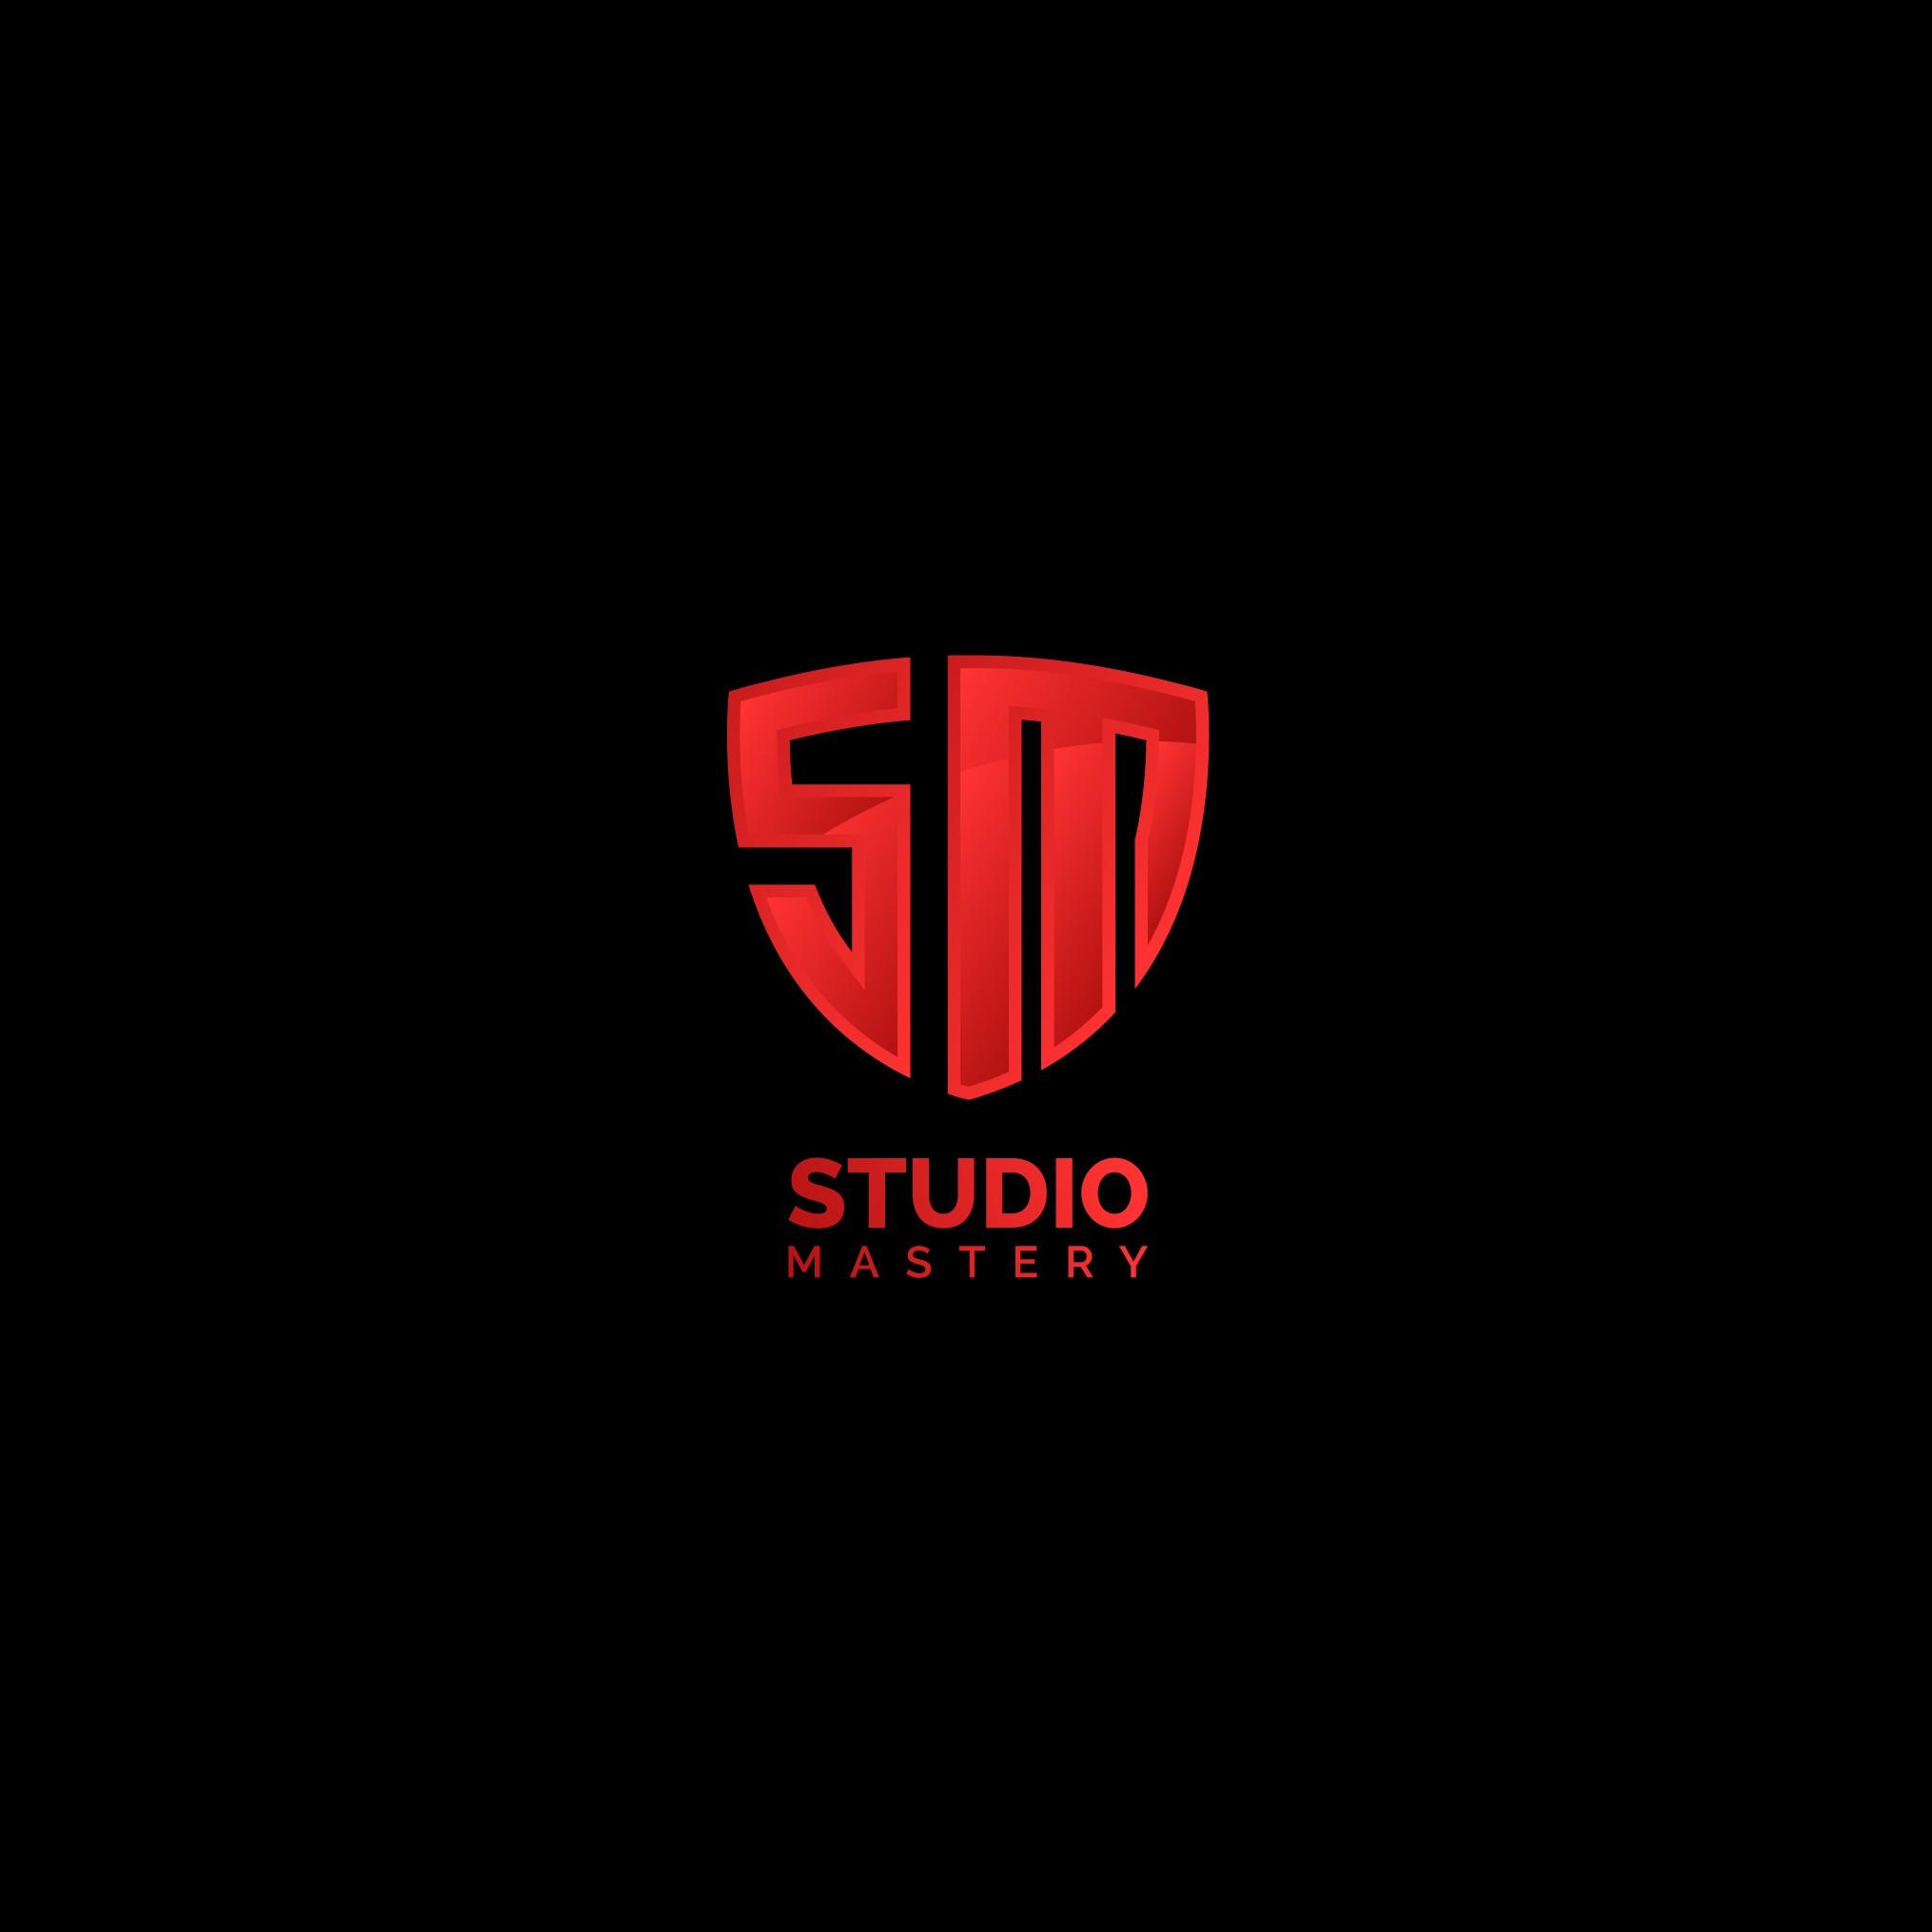 Logo design for Studio Mastery